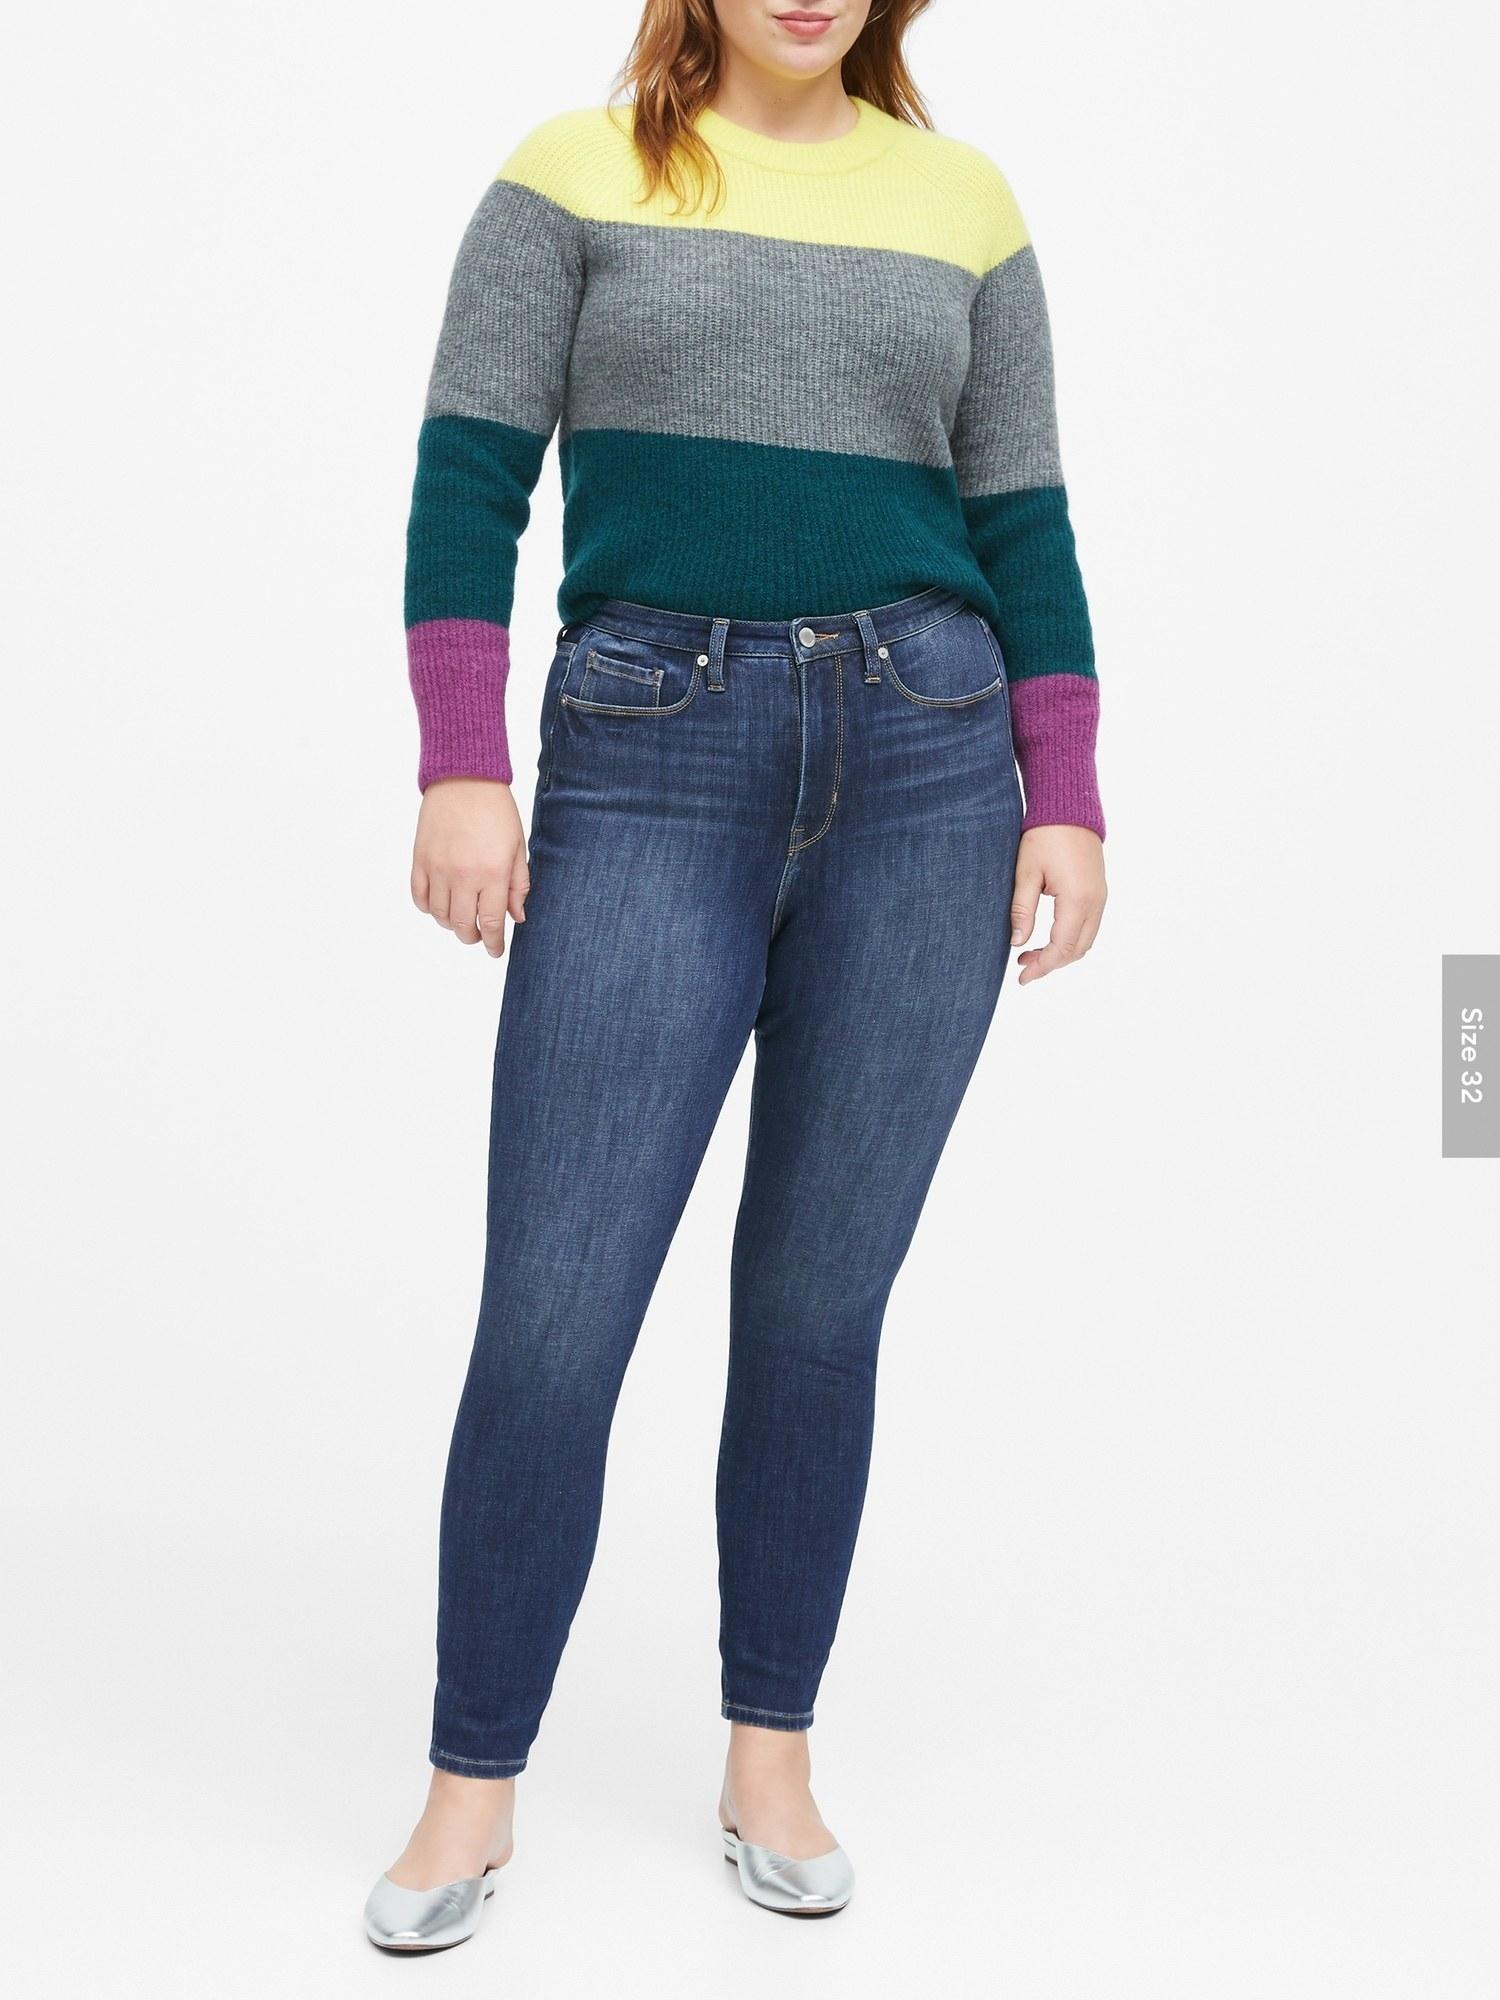 Model wearing the jeans in a medium denim wash